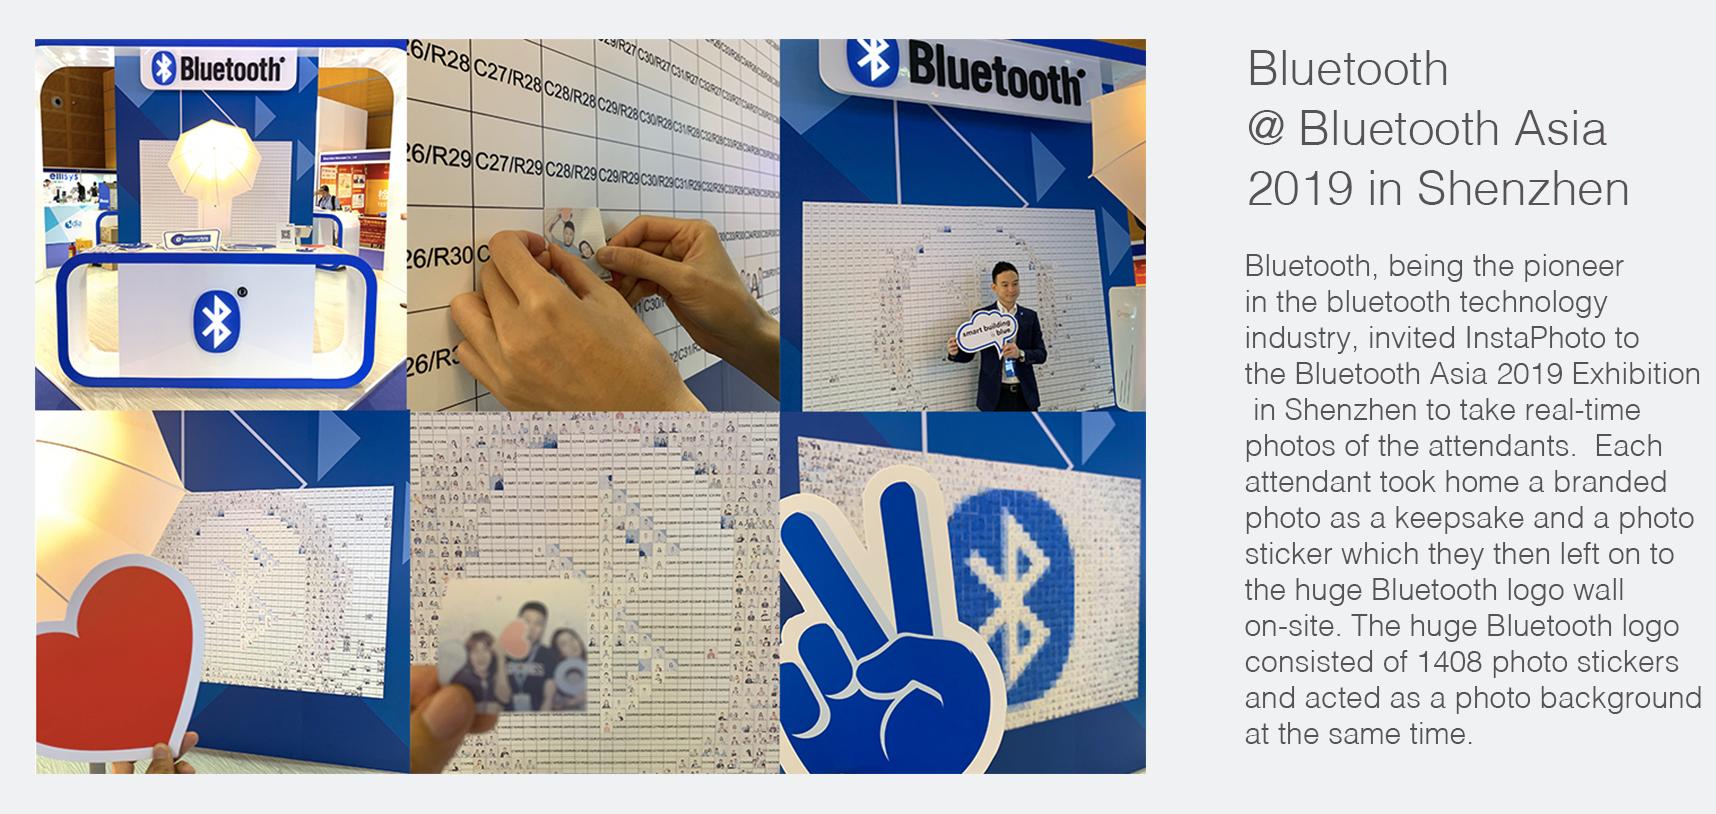 bluetooth0911 en.png